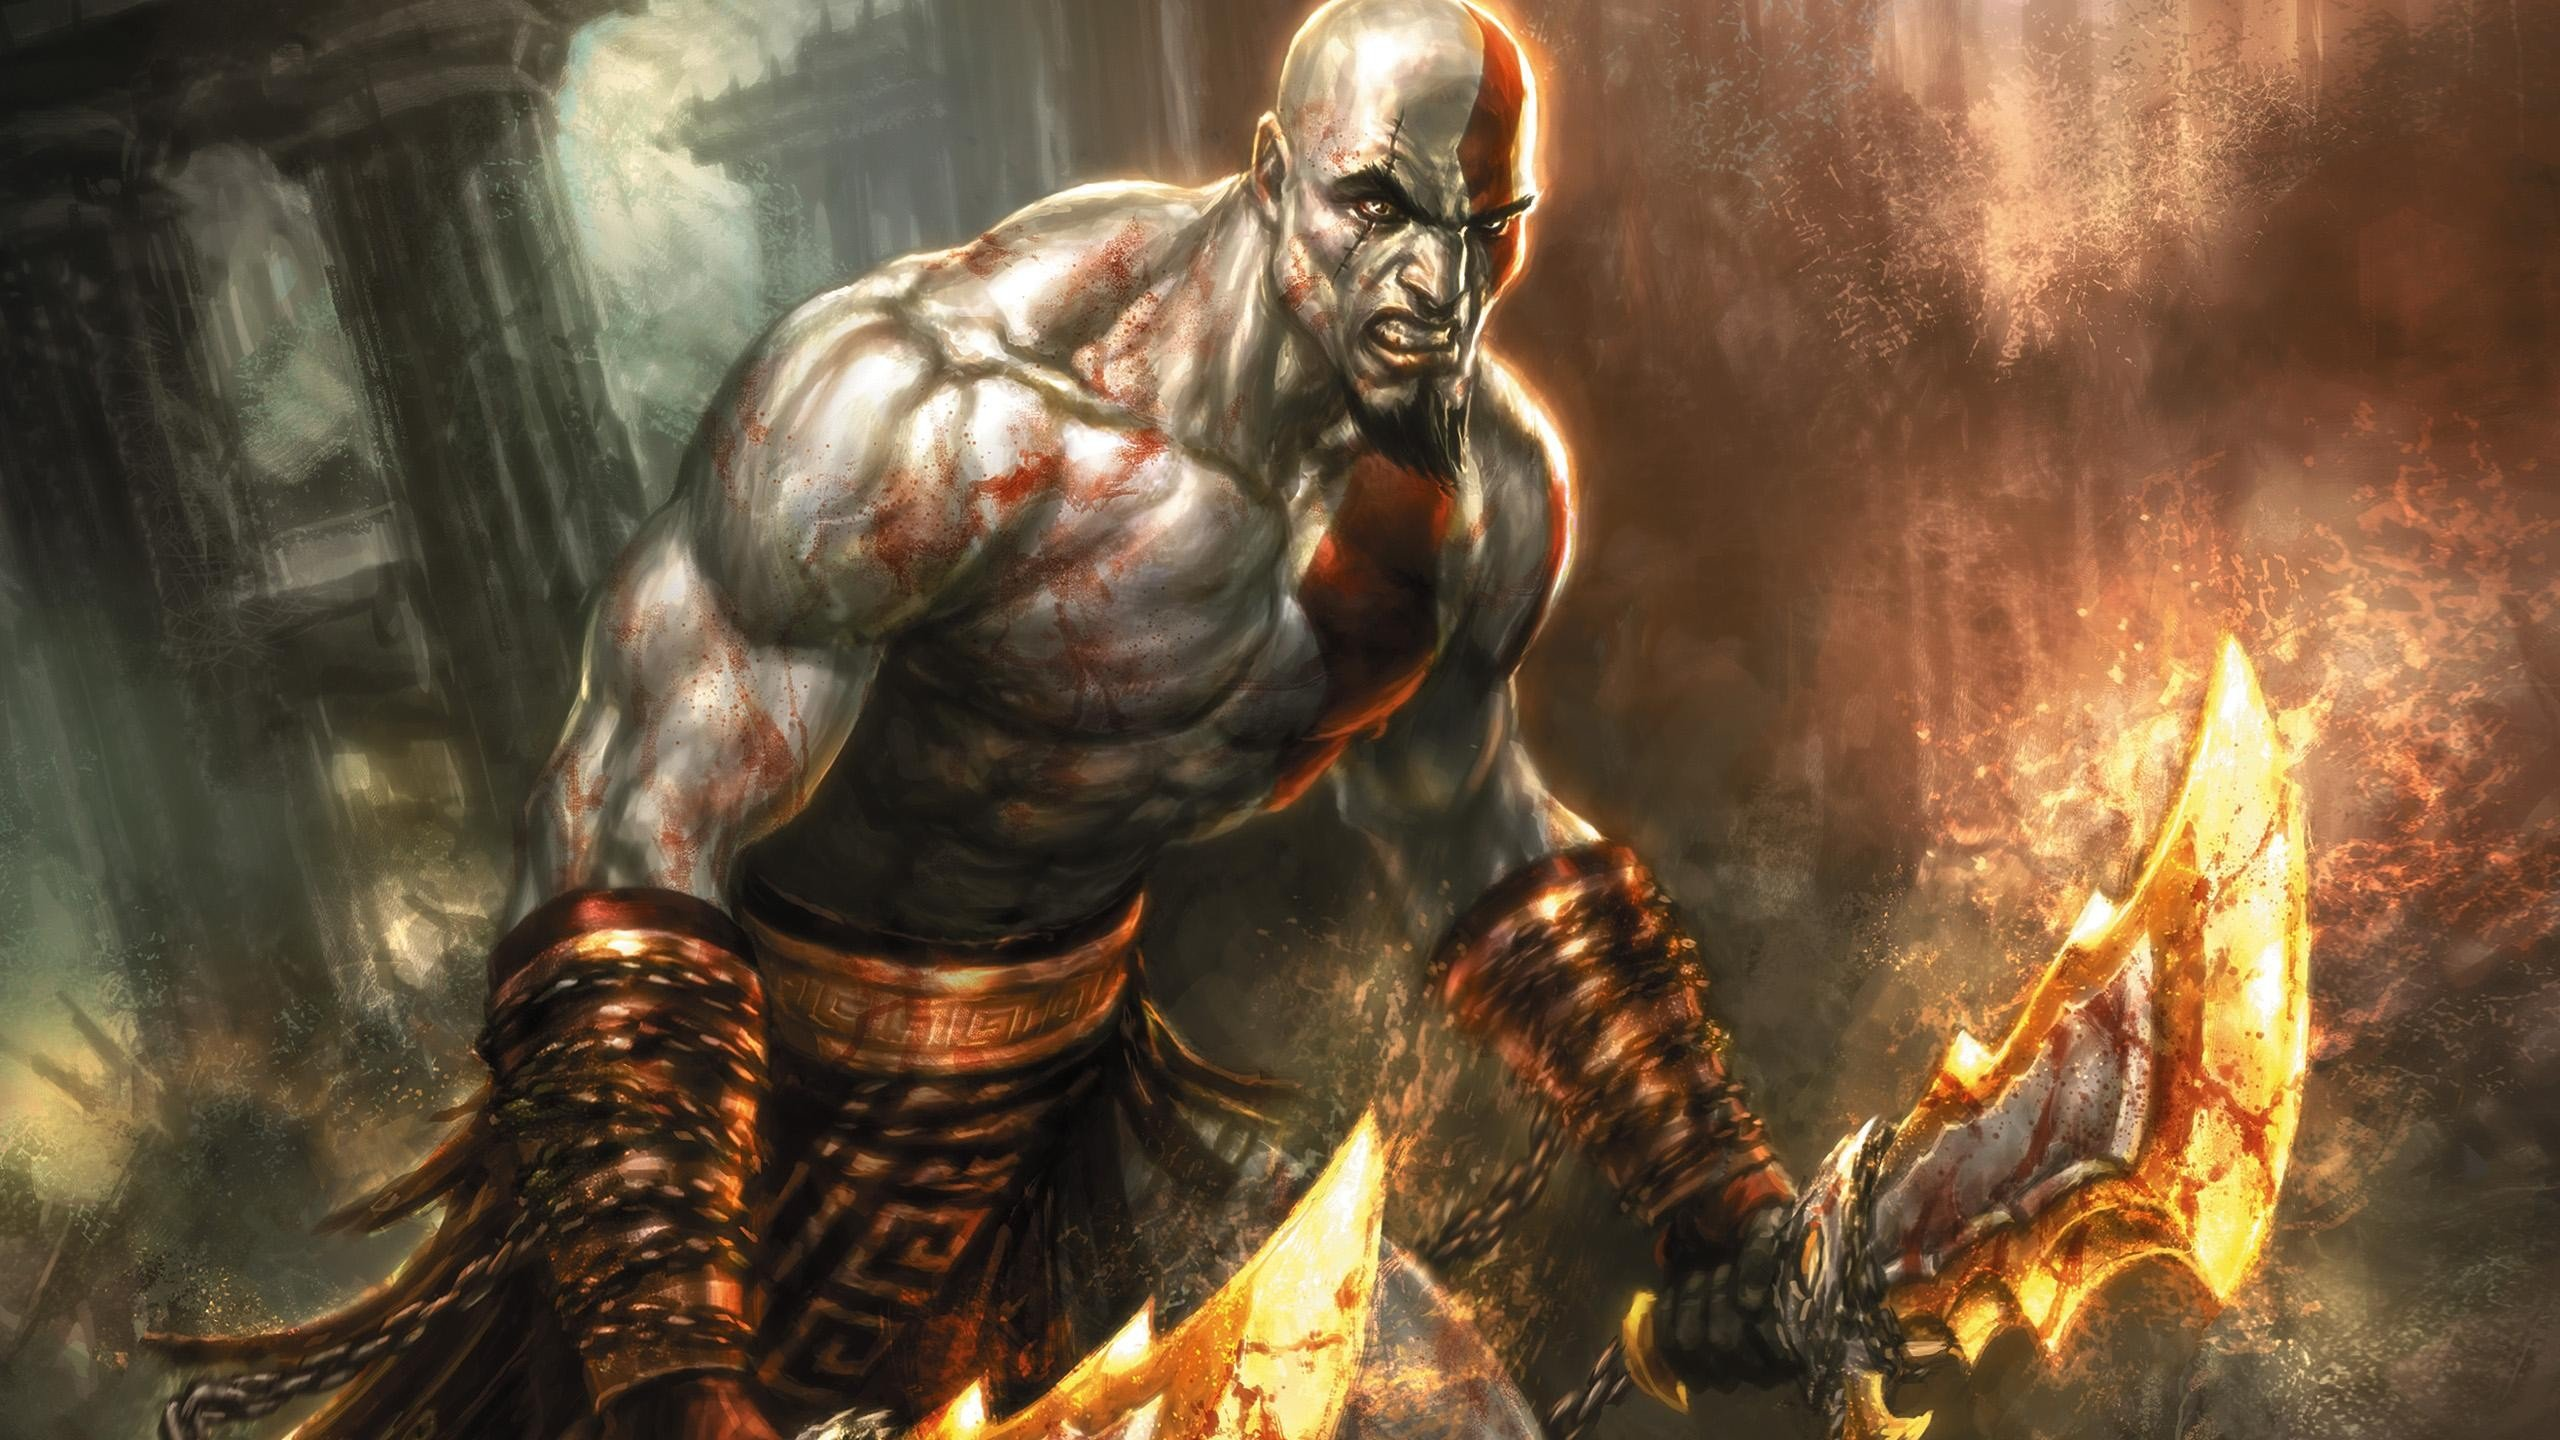 4008883-game-wallpapers-kratos-god-war-wallpaper-31421